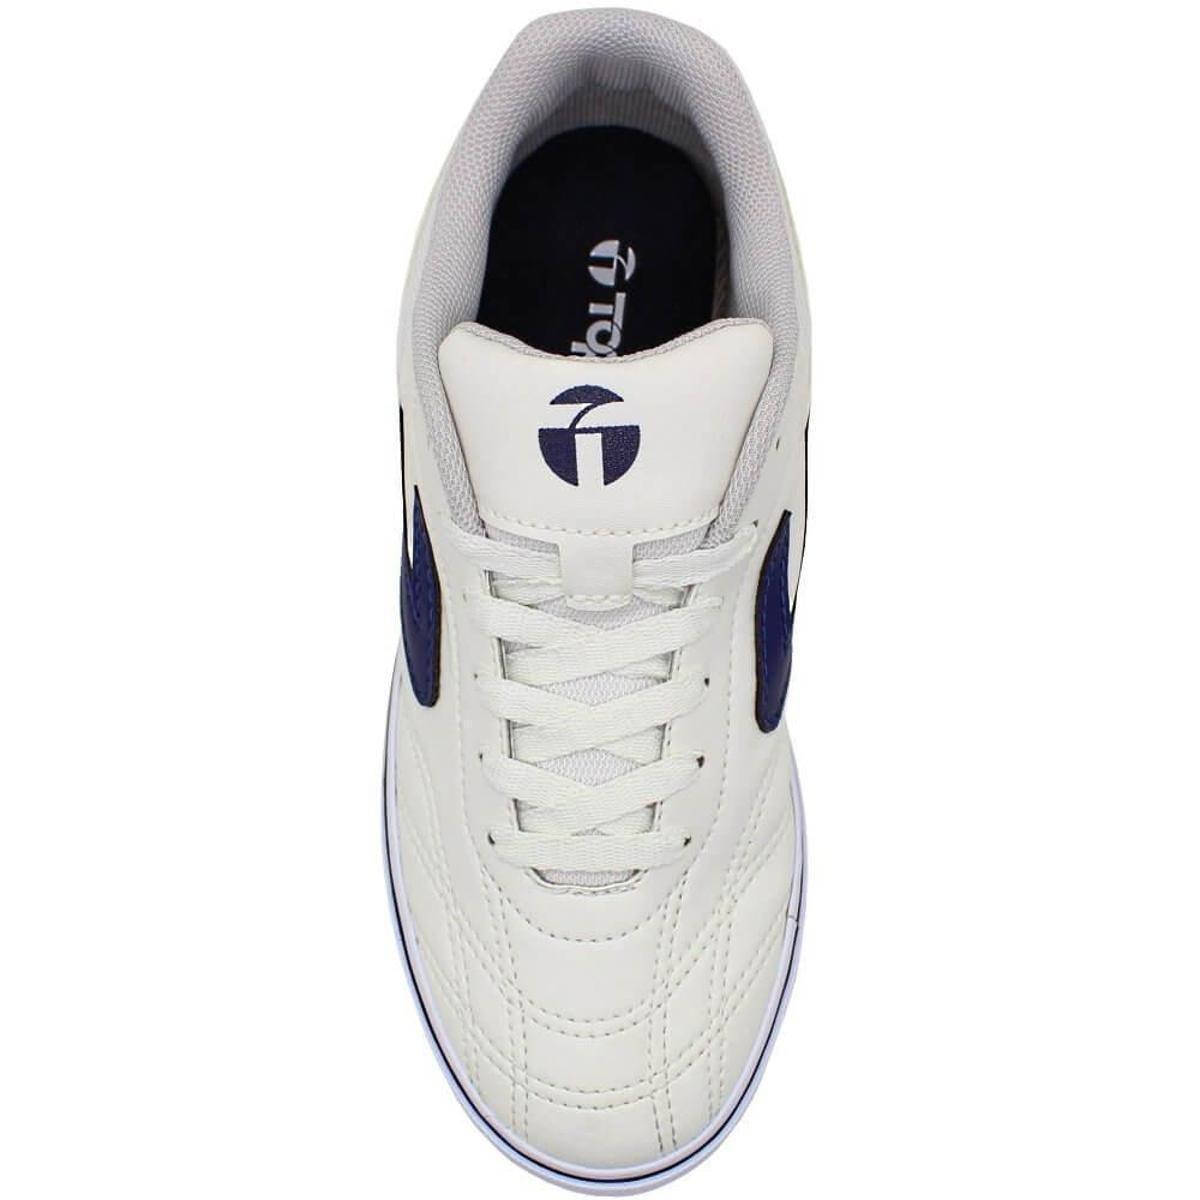 Tênis Topper Dominator 3 Futsal Masculino - Branco e Azul - Compre ... 3c8ca4b68ef1d